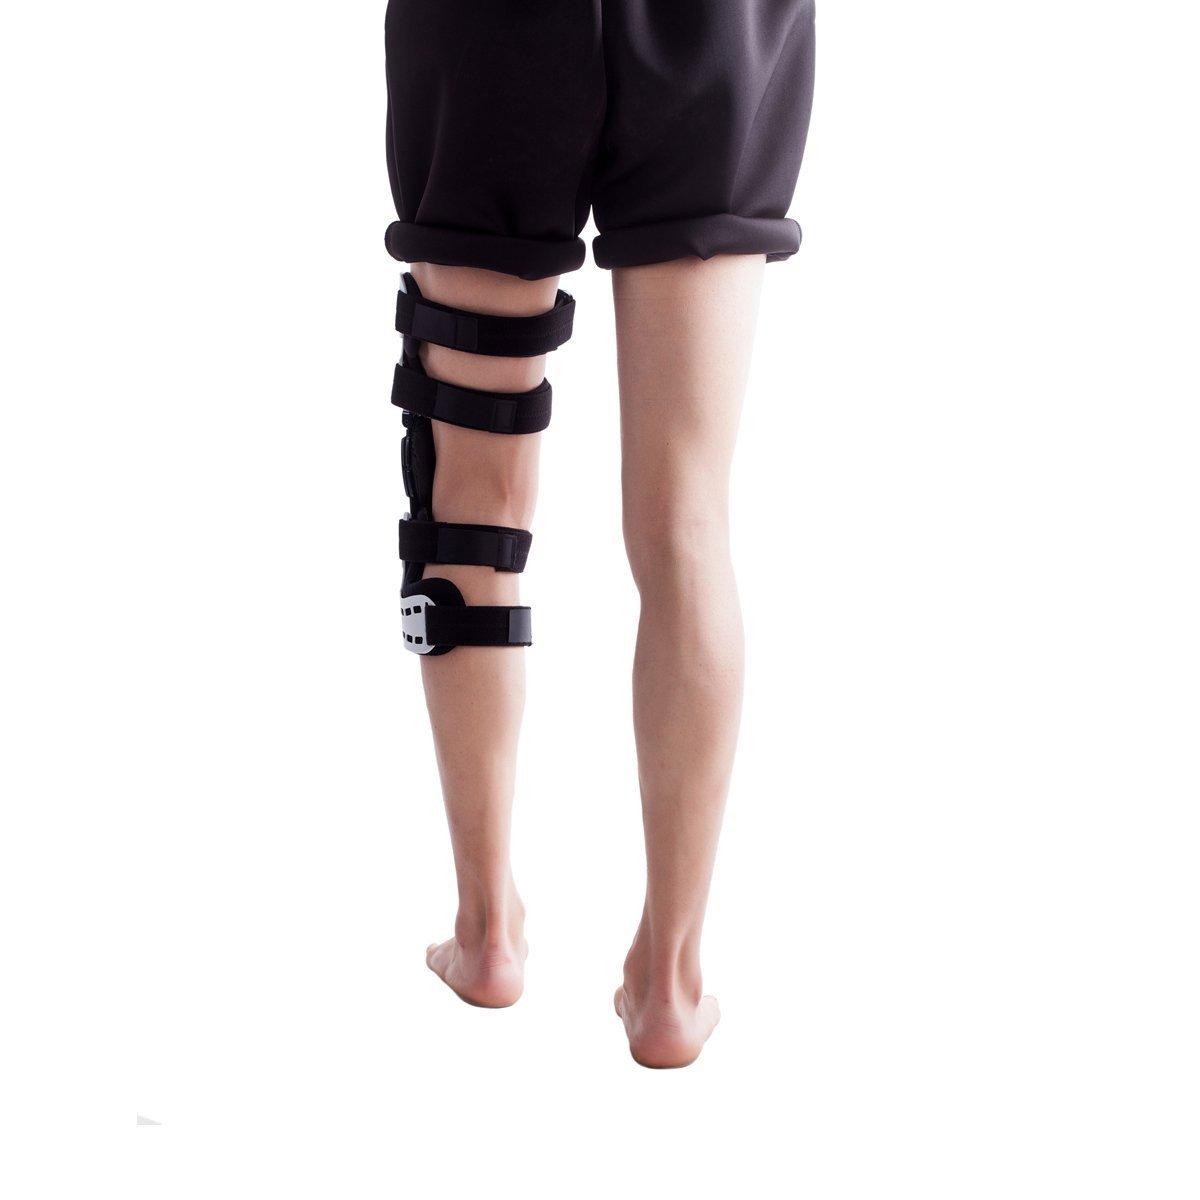 Orthomen OA Unloading Knee Brace for Osteoarthritis – Bone on Bone - Lateral Support - Size: Universal/Left by Orthomen (Image #3)